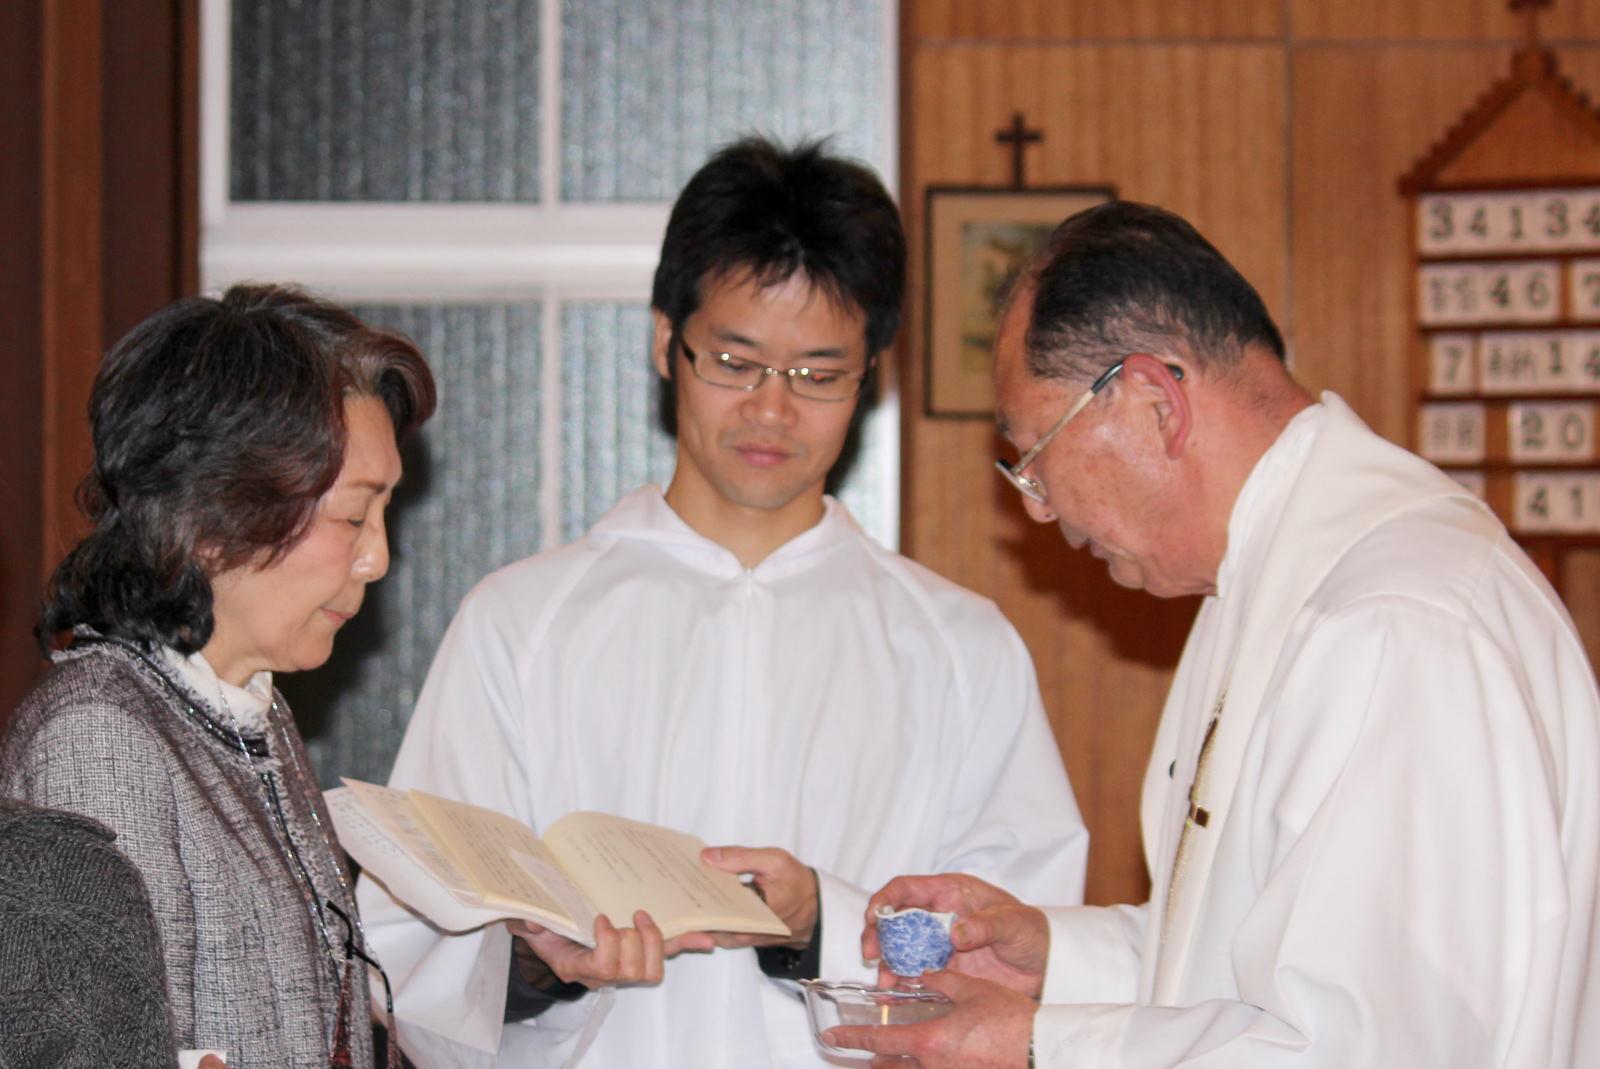 20130330_baptism02